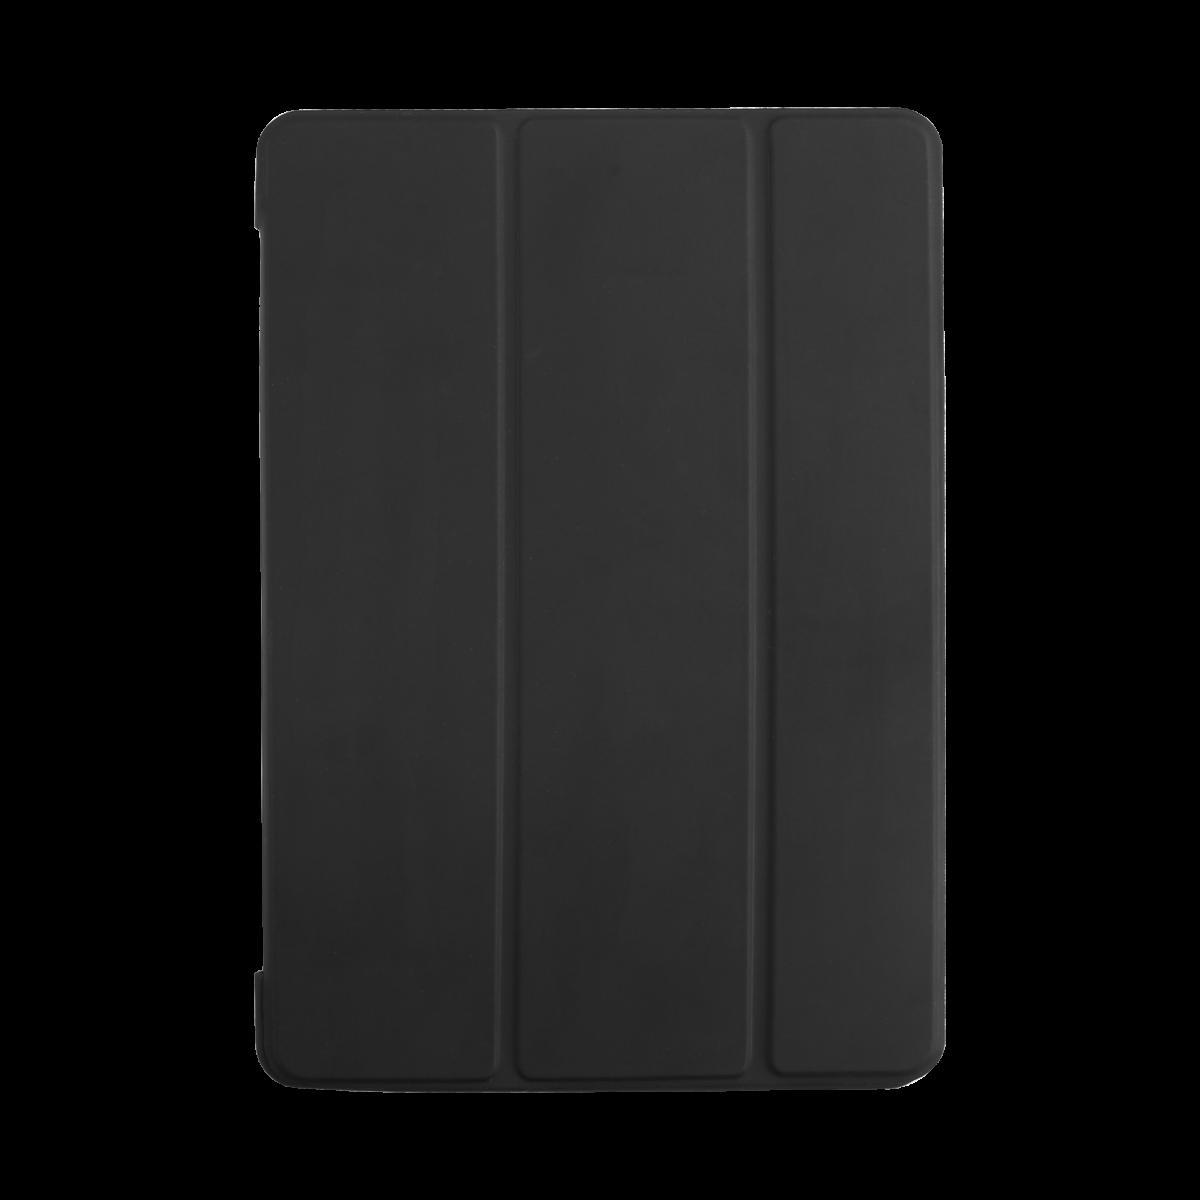 کاور سیلیکونی آیپد ۱۰.۲ اینچ